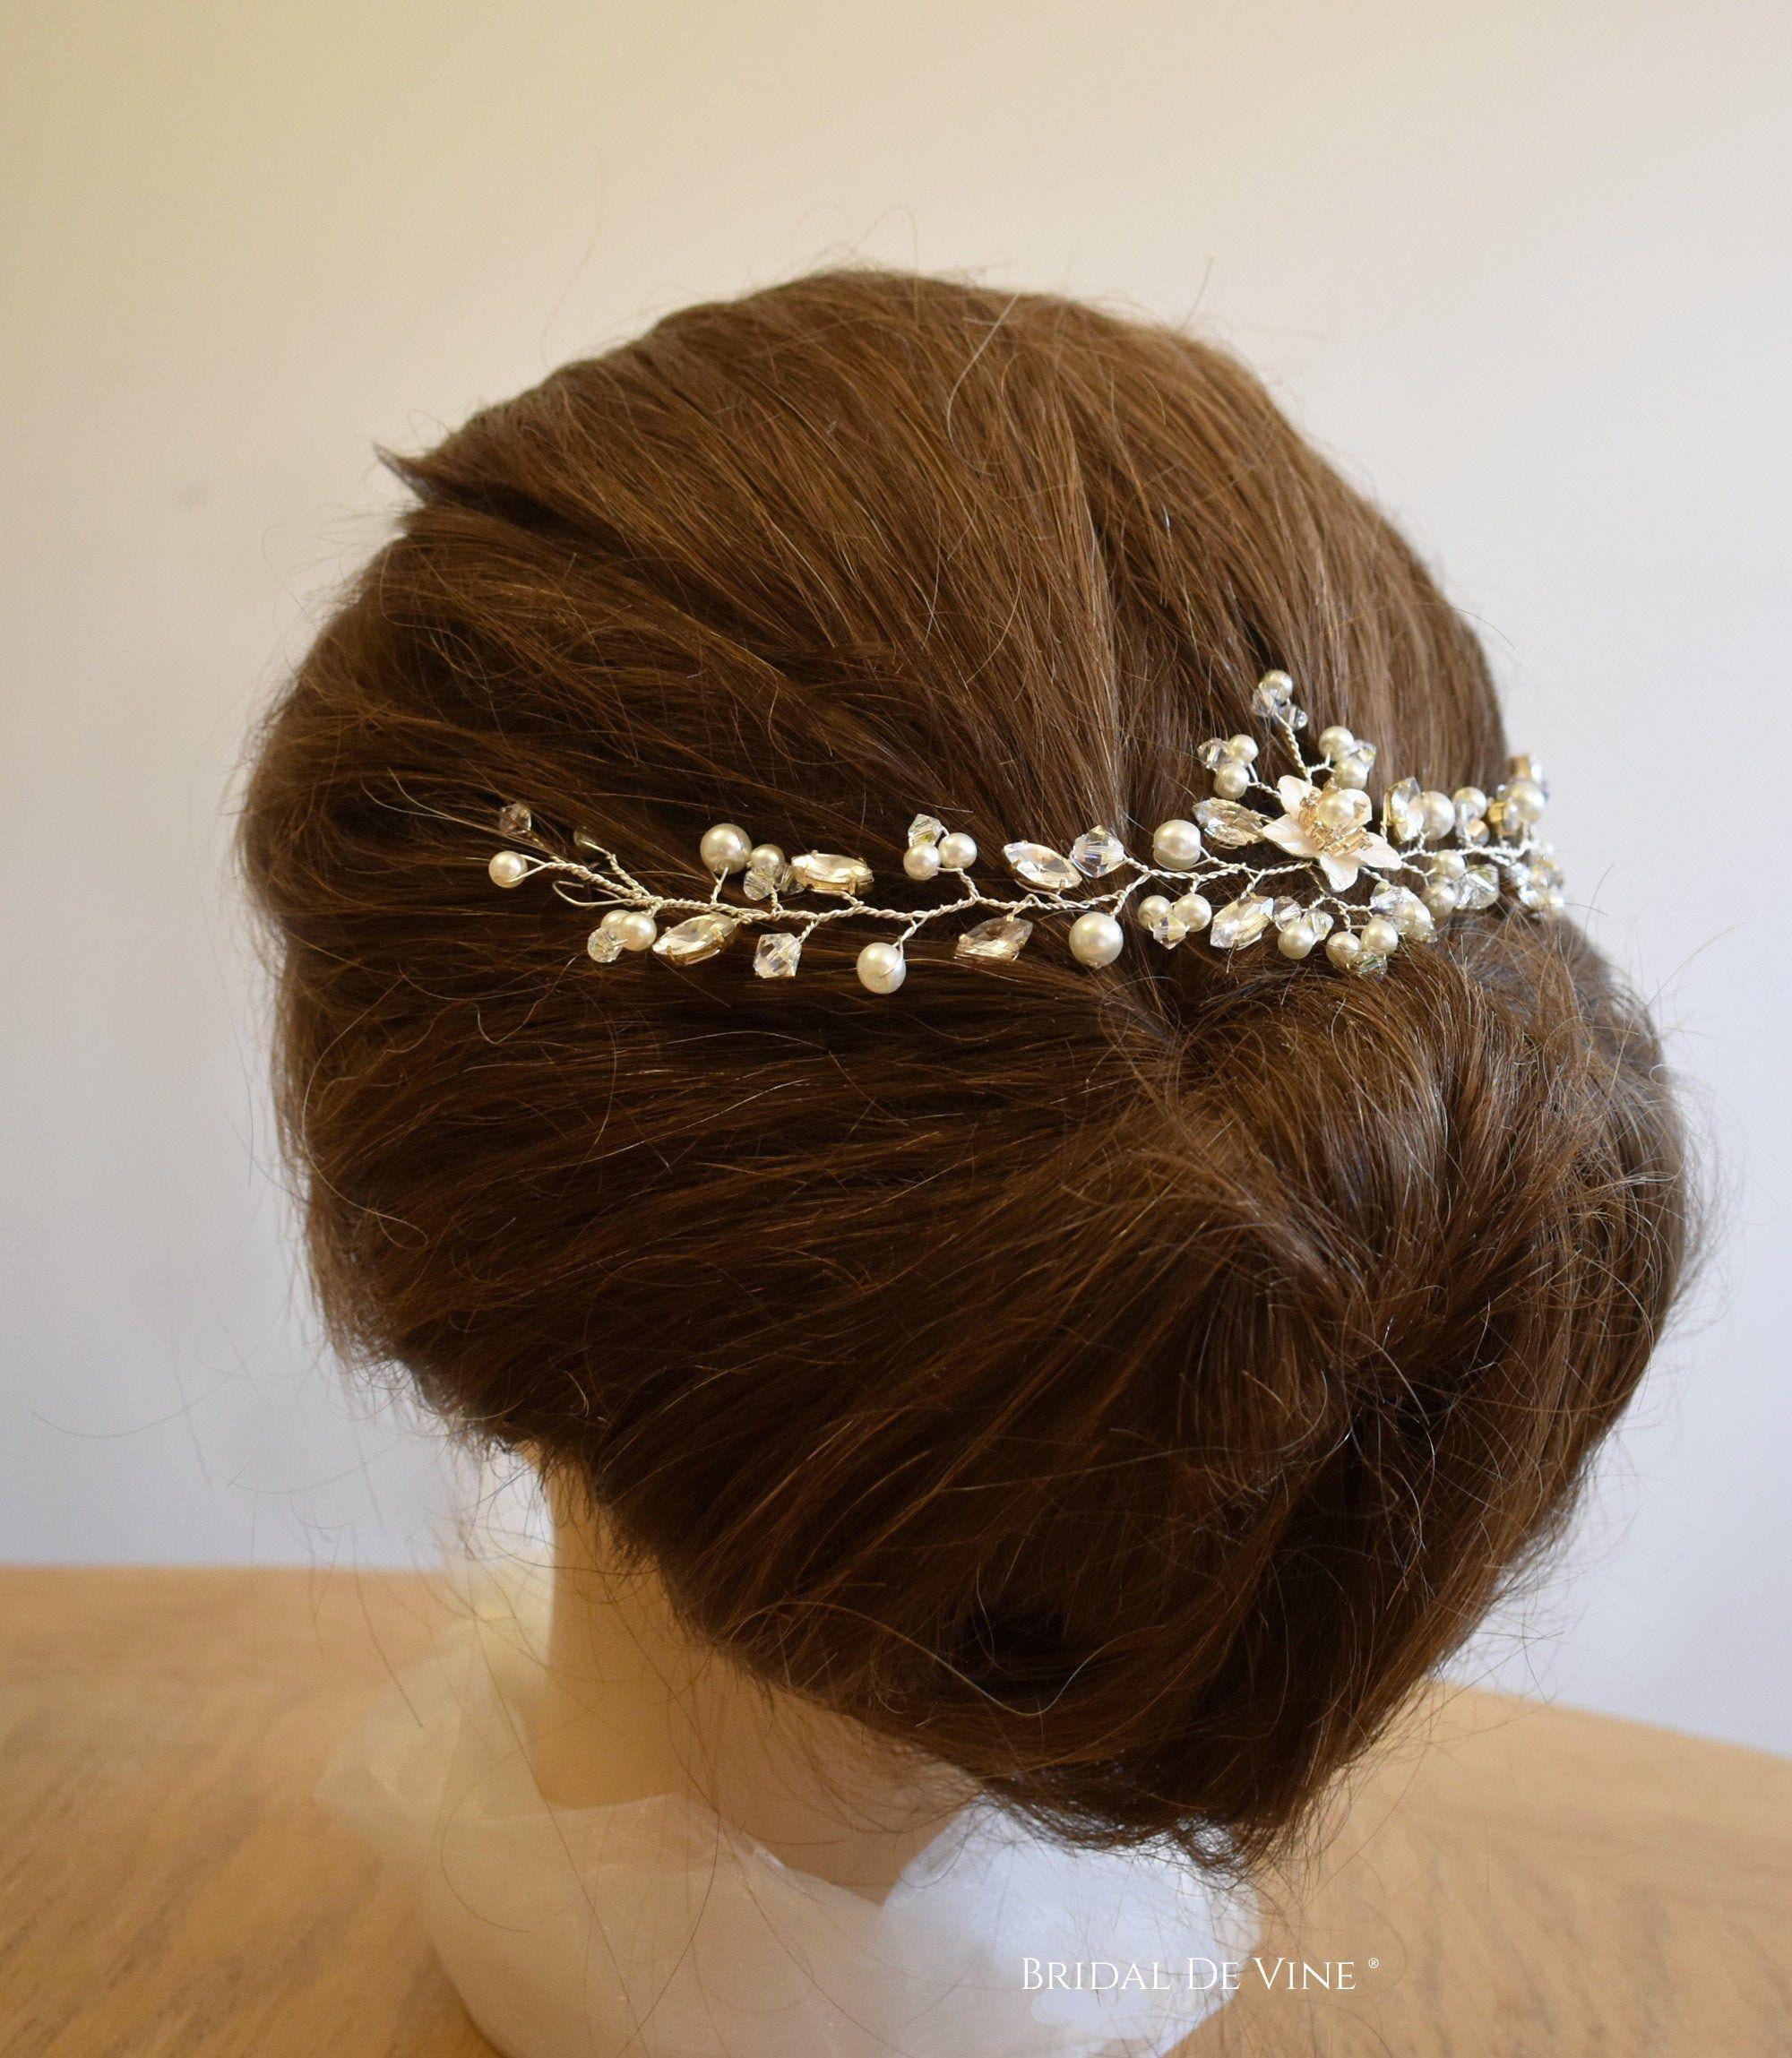 Silver crystal flower bridal headband Diamante accessory hair accessories wedding headpiece tiara